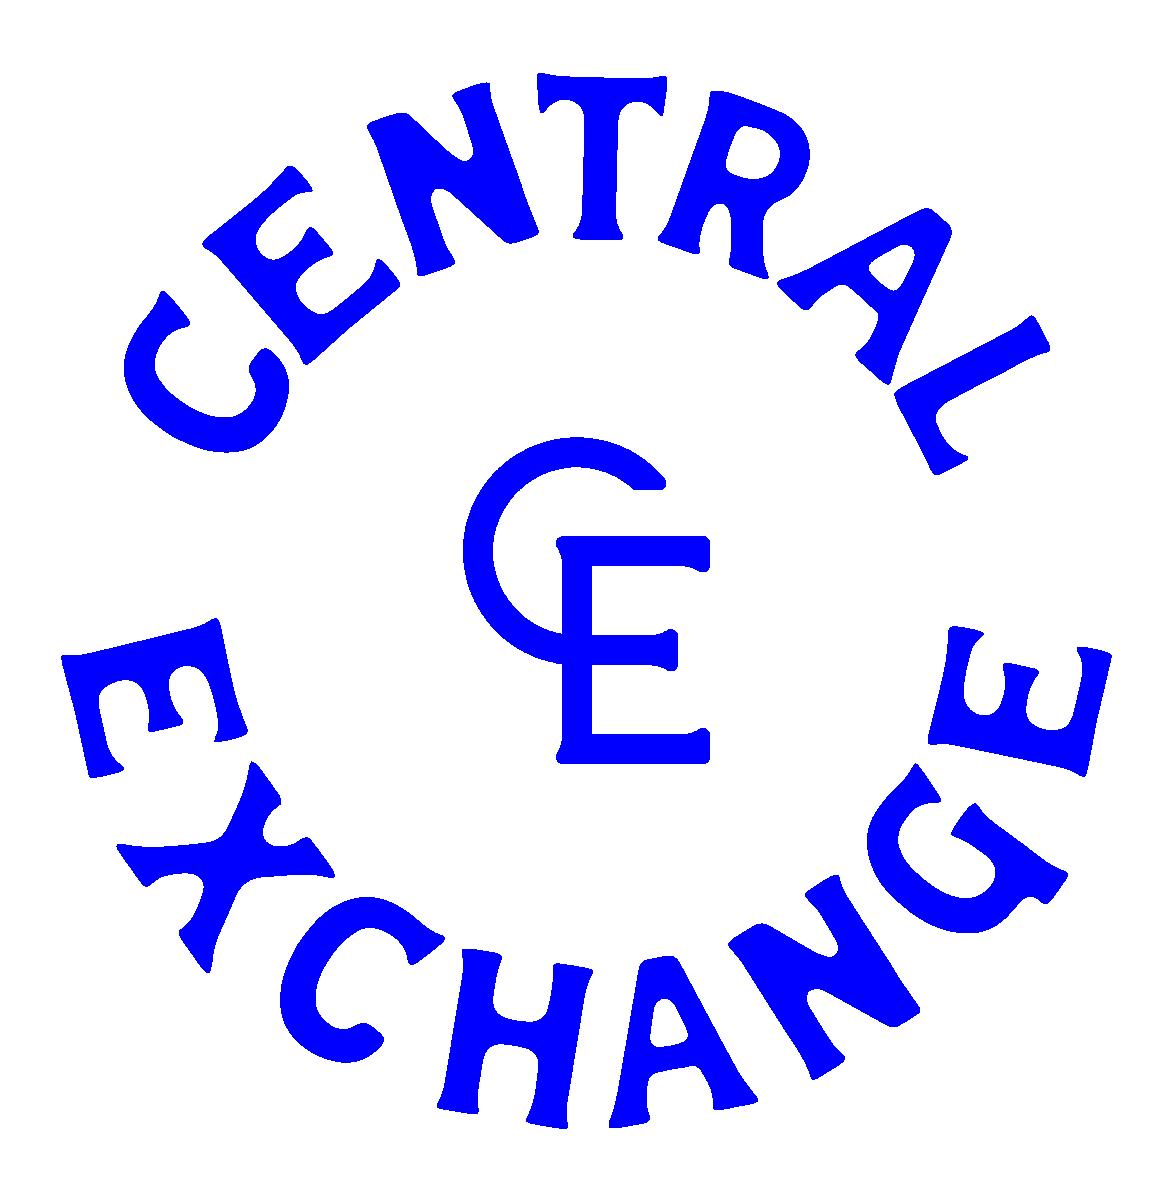 CE_Circle-01.png